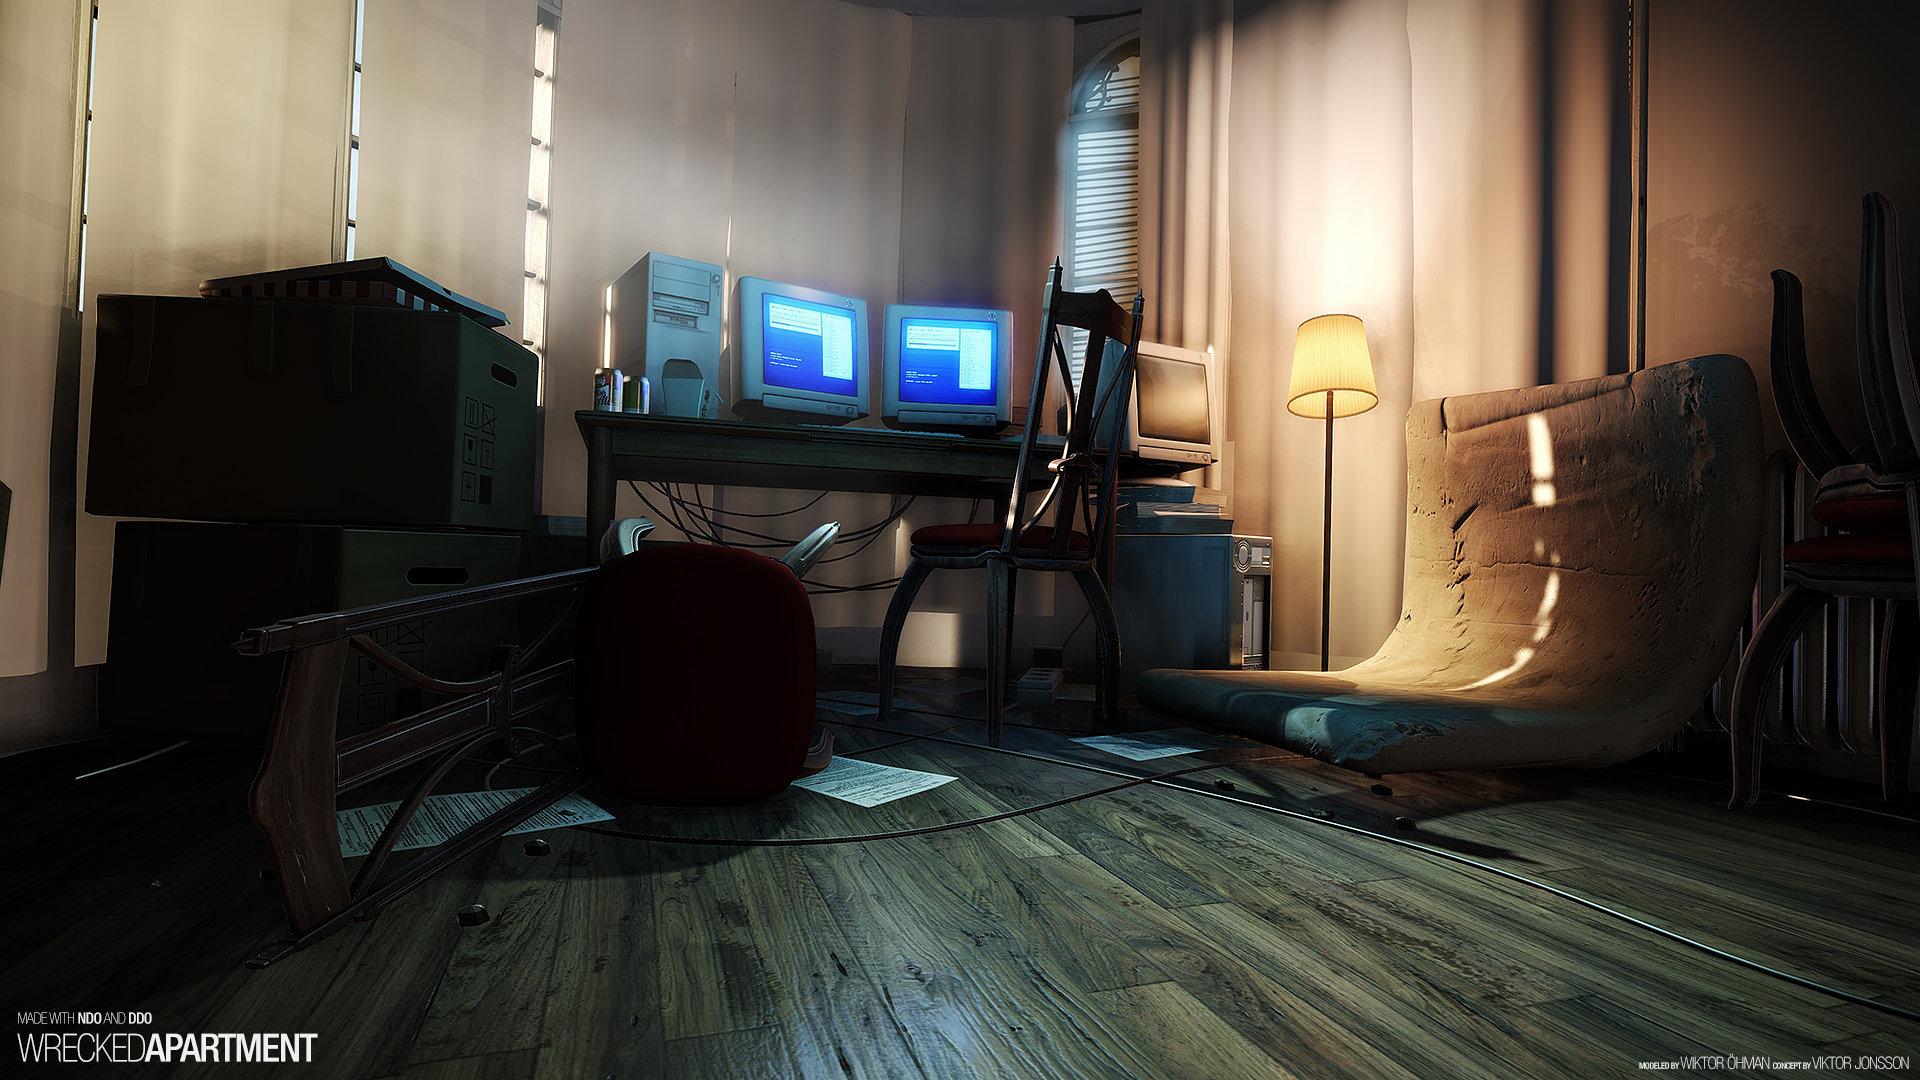 Wrecked Apartment (NDO & DDO)